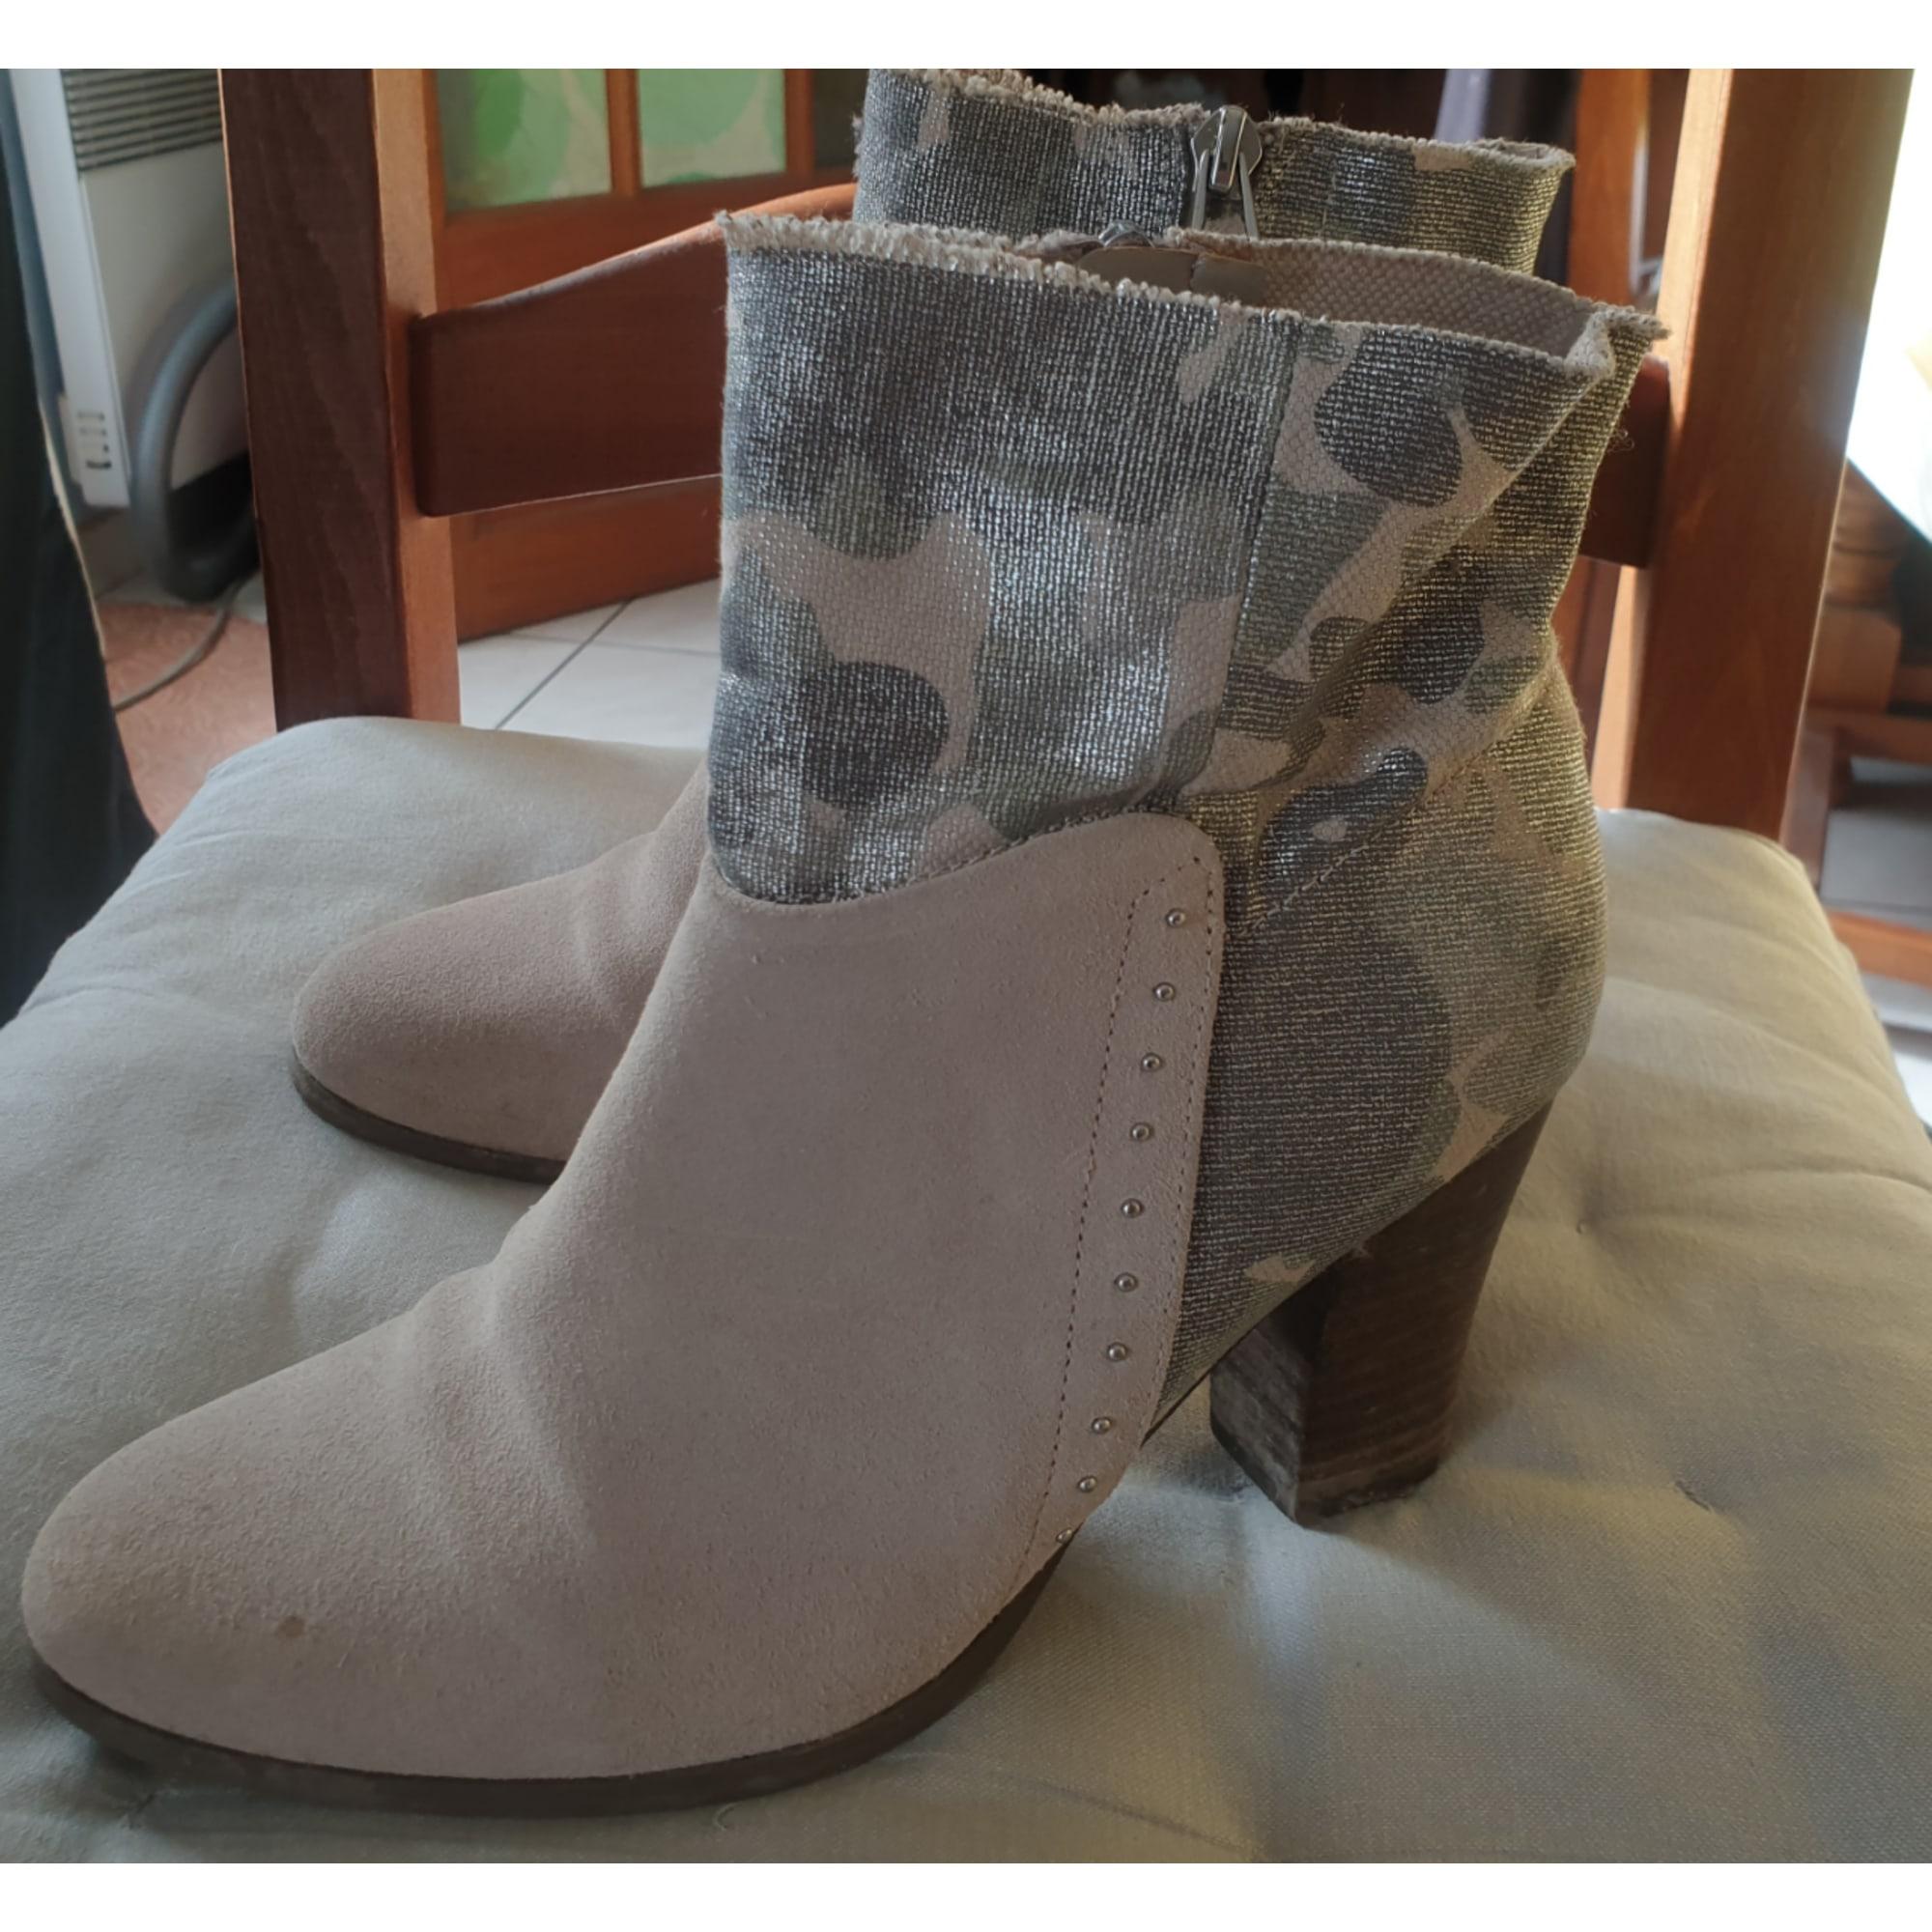 Bottines & low boots à talons GUESS Gris, anthracite